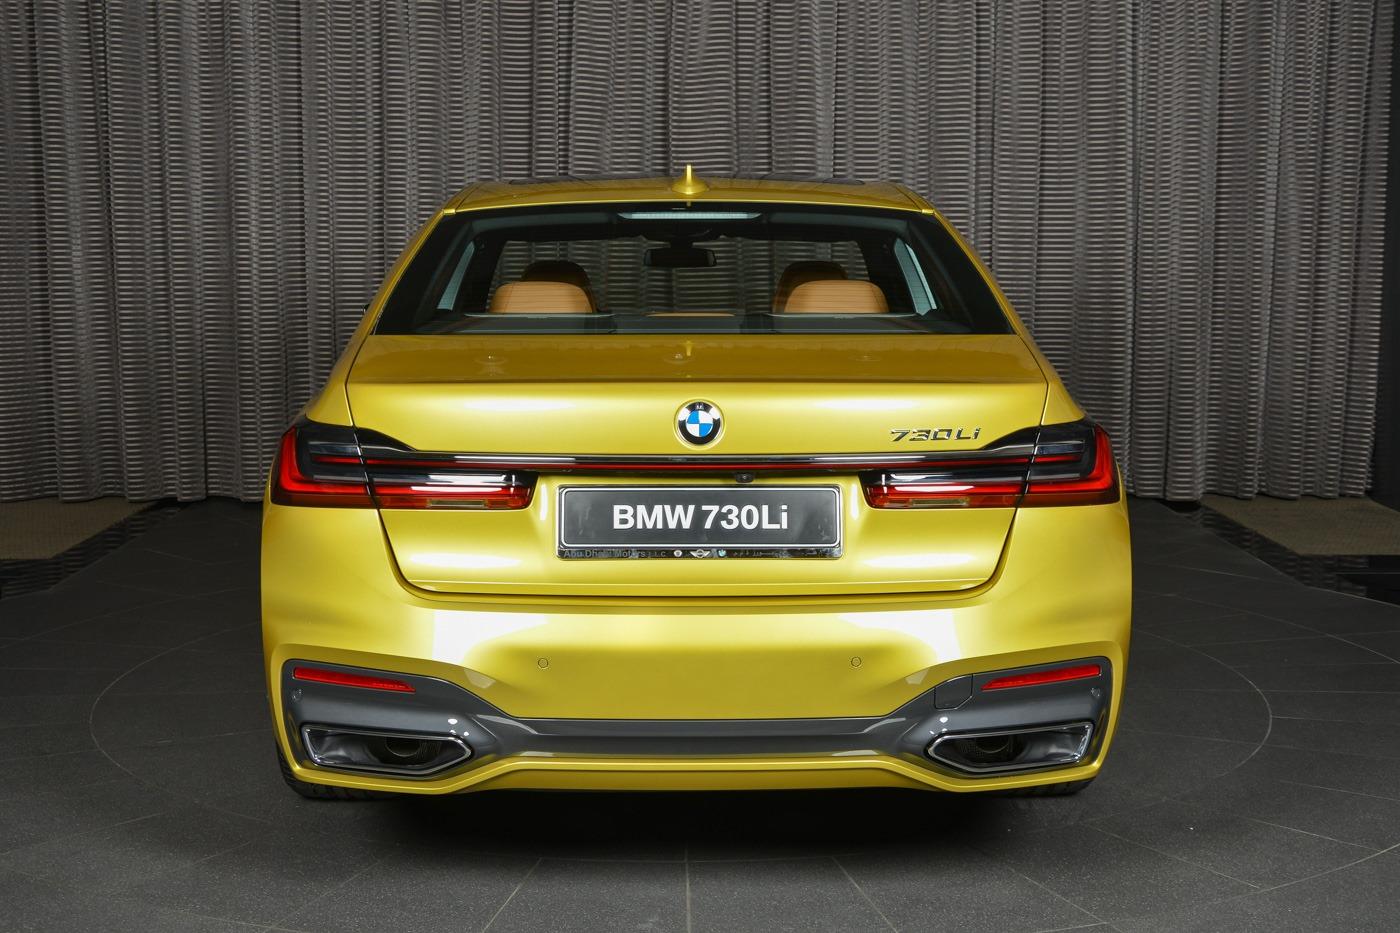 BMW-7-Series-730Li-M-Sport-Package-in-Austin-Yellow-6